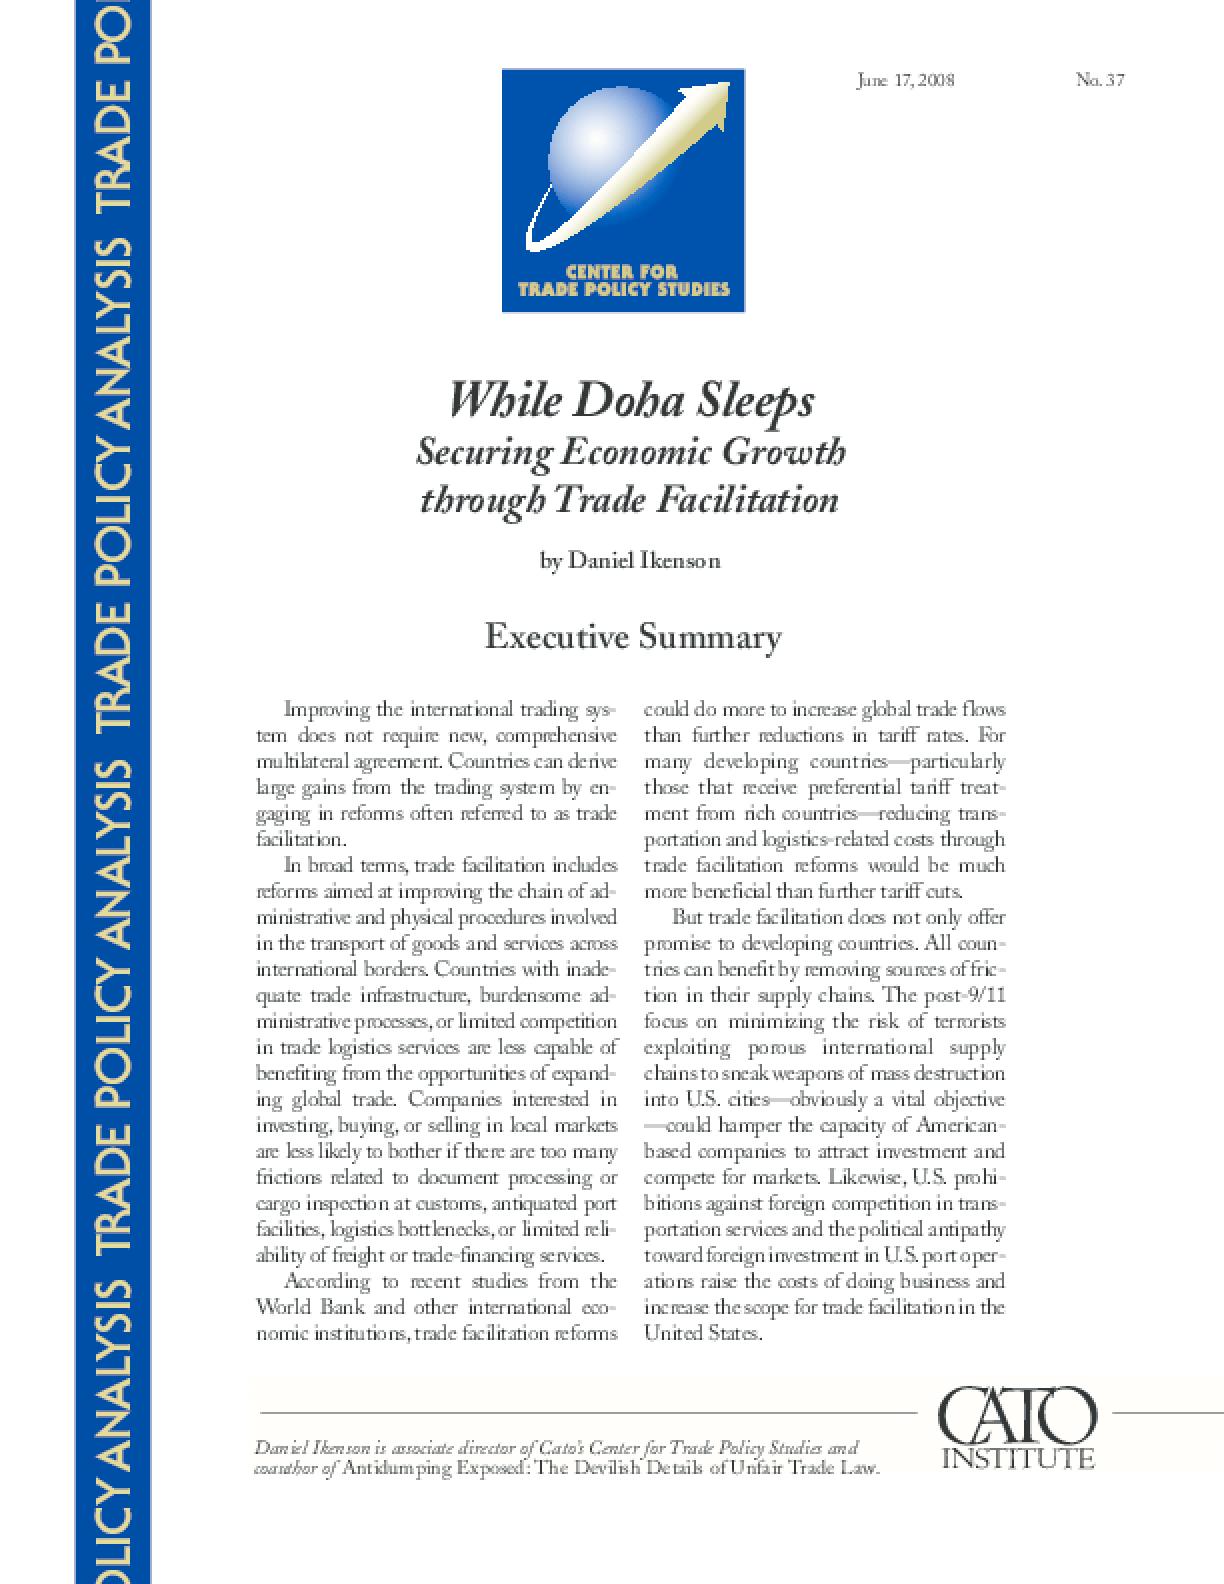 While Doha Sleeps: Securing Economic Growth through Trade Facilitation